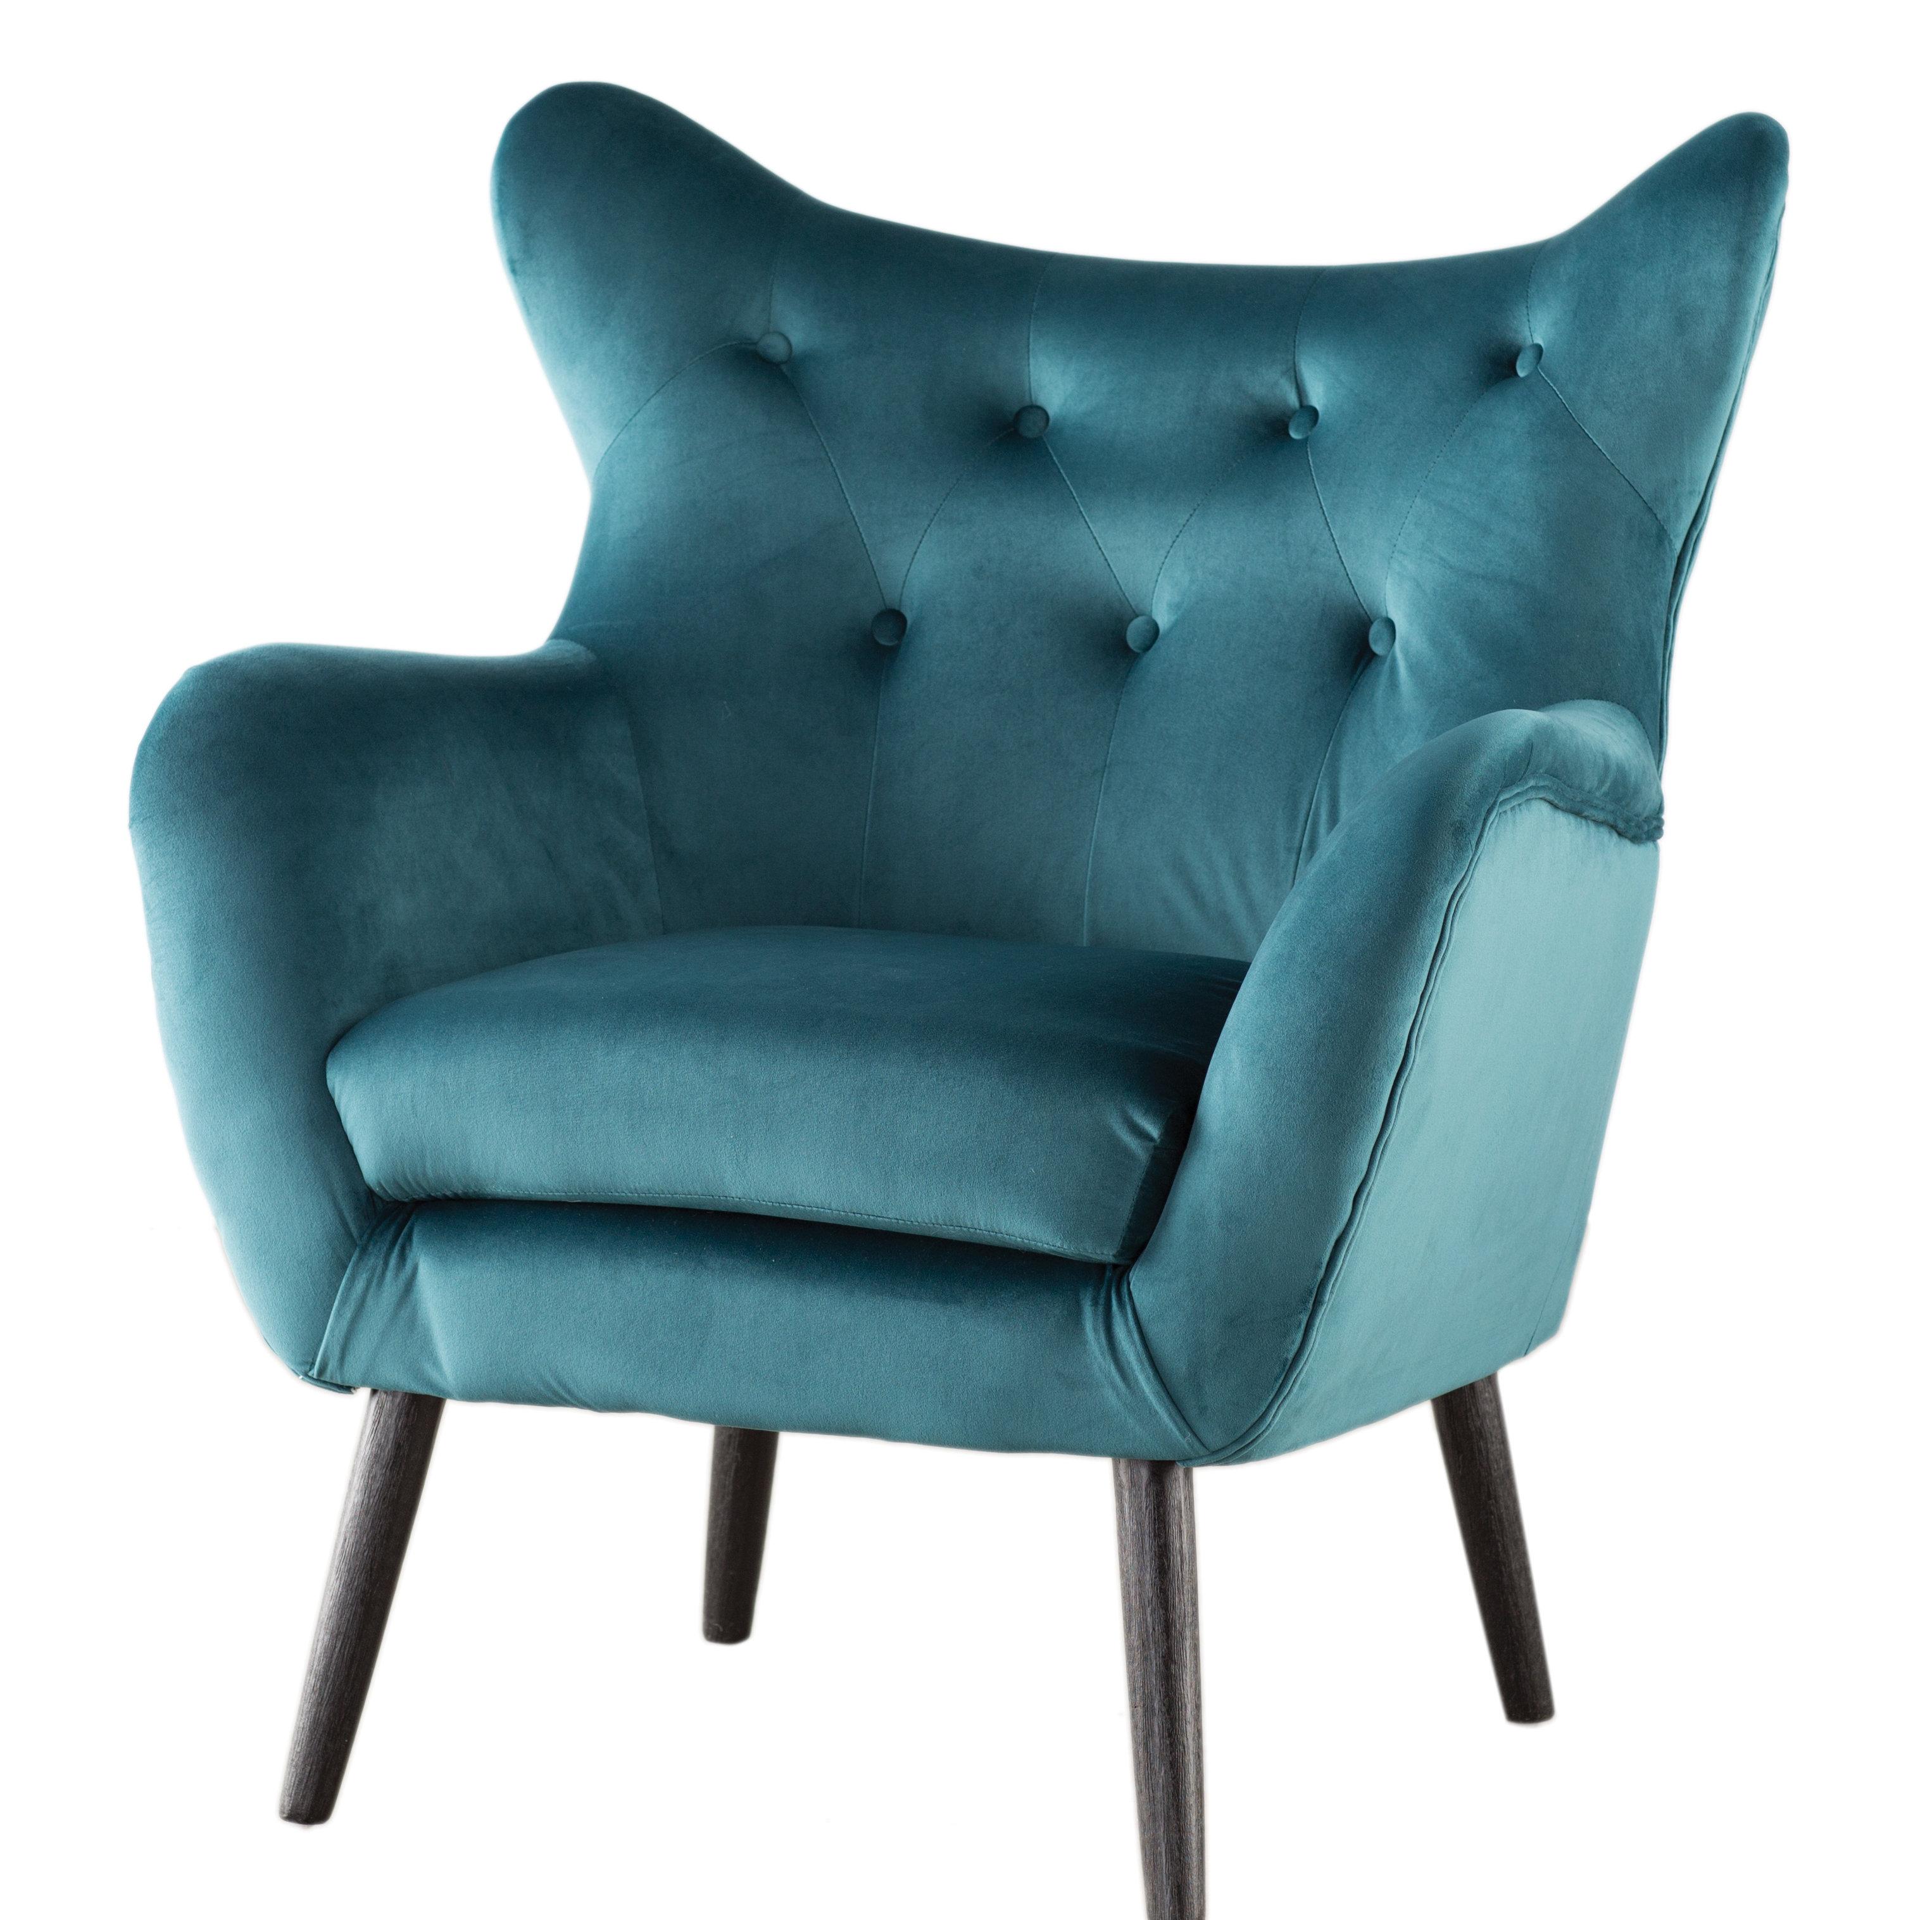 Merveilleux Willa Arlo Interiors Bouck Wingback Chair U0026 Reviews   Wayfair